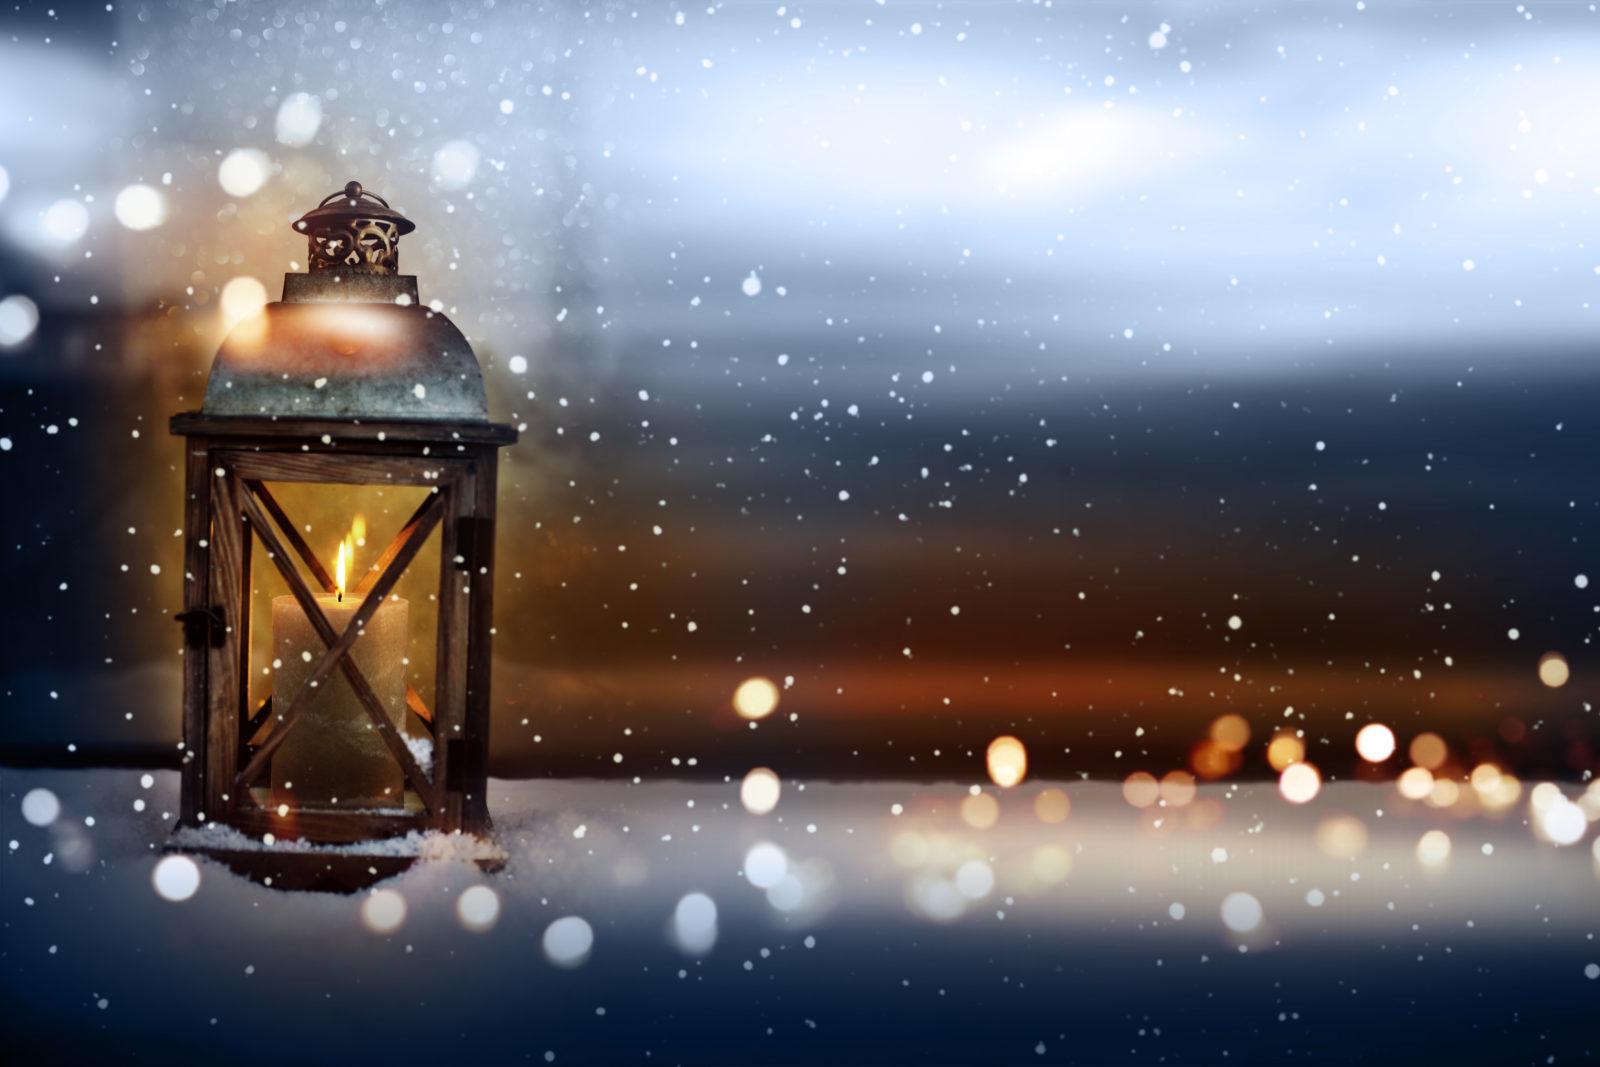 Burning Lantern In Snowy Winter